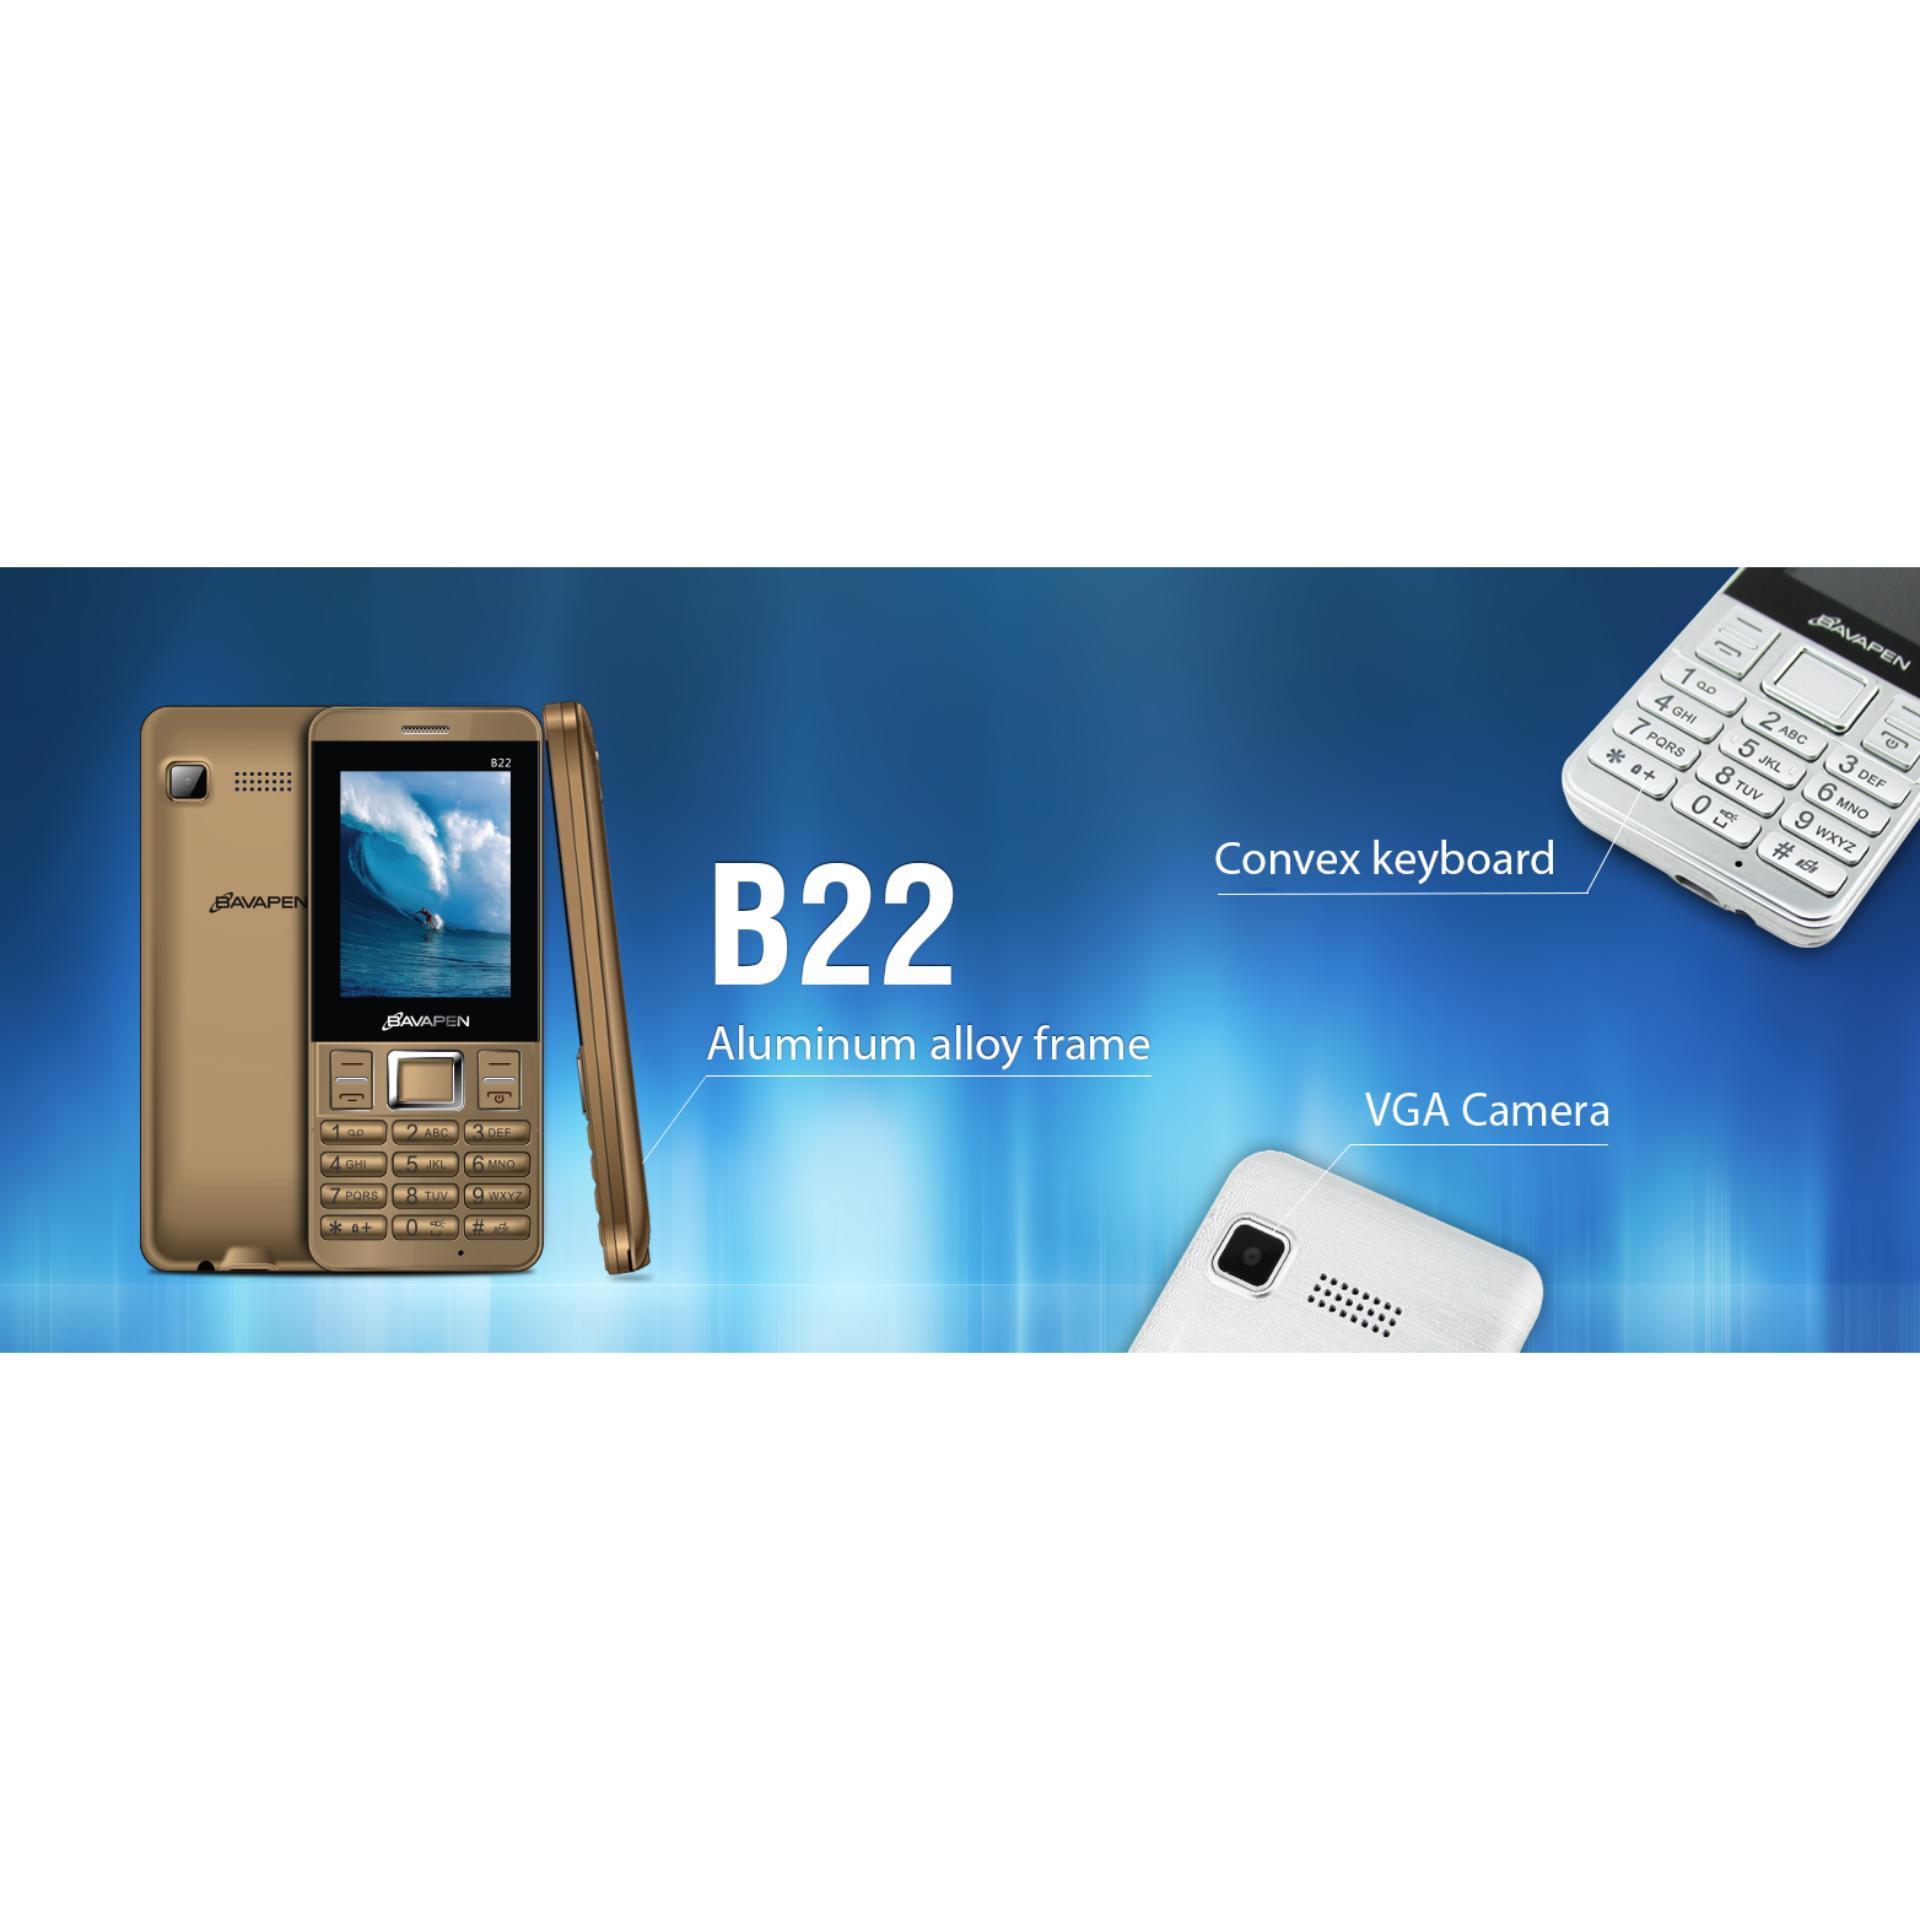 Bavapen B22 – Tặng Ngay 1 Áo Mưa Cao Cấp